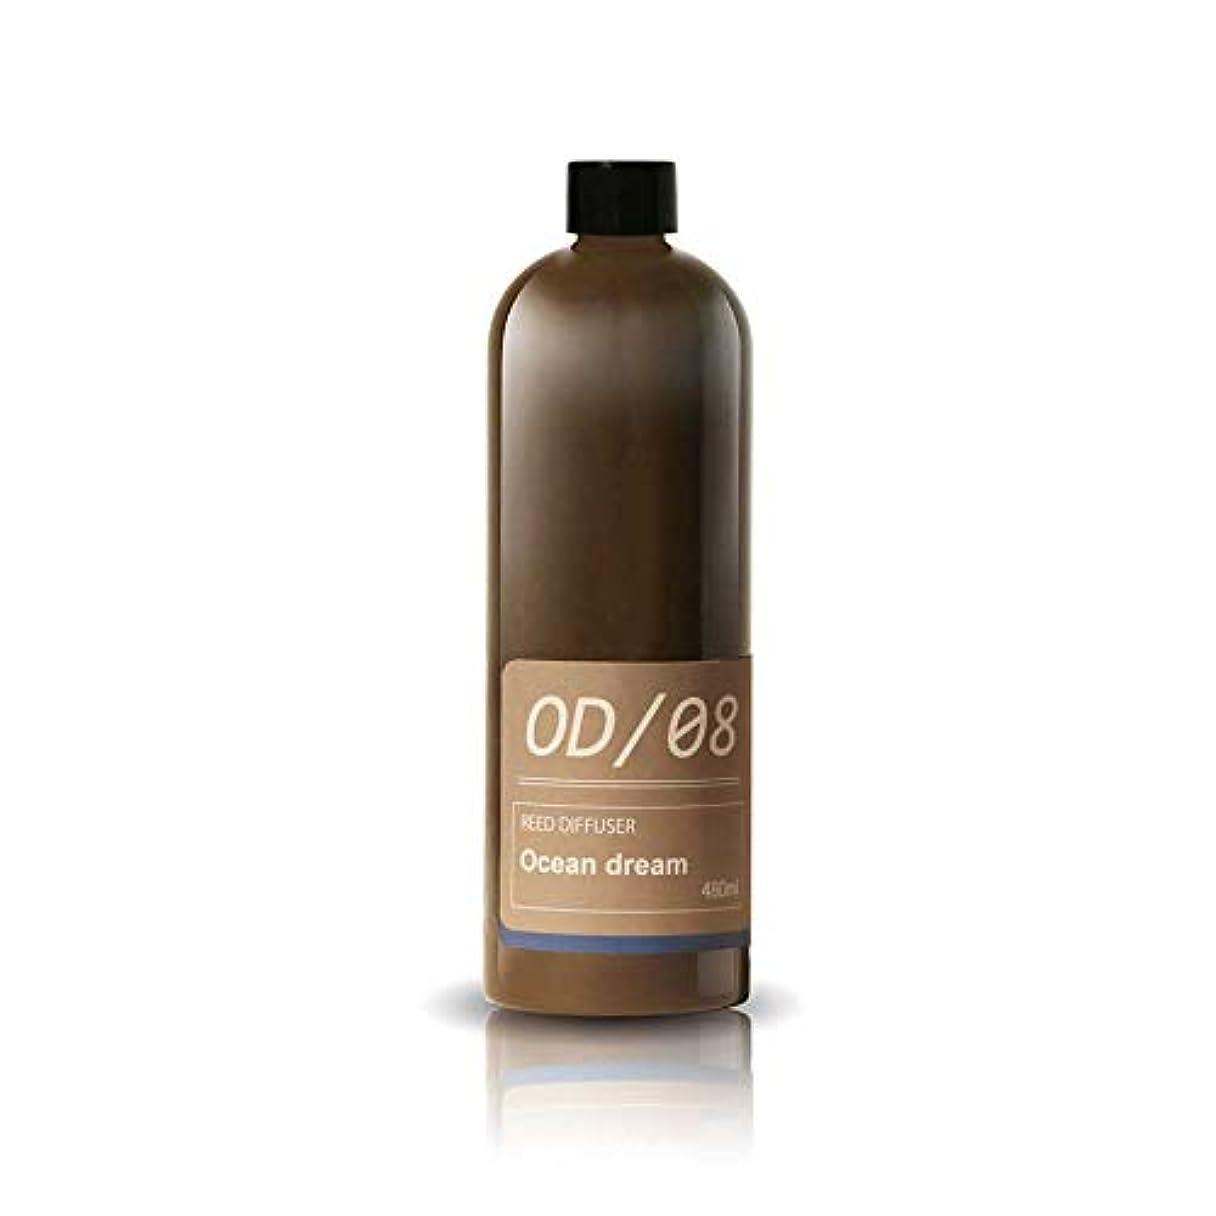 mercyu(メルシーユー) 詰替用フレグランスオイル480ml MRUS-50 (D(オーシャンドリーム))